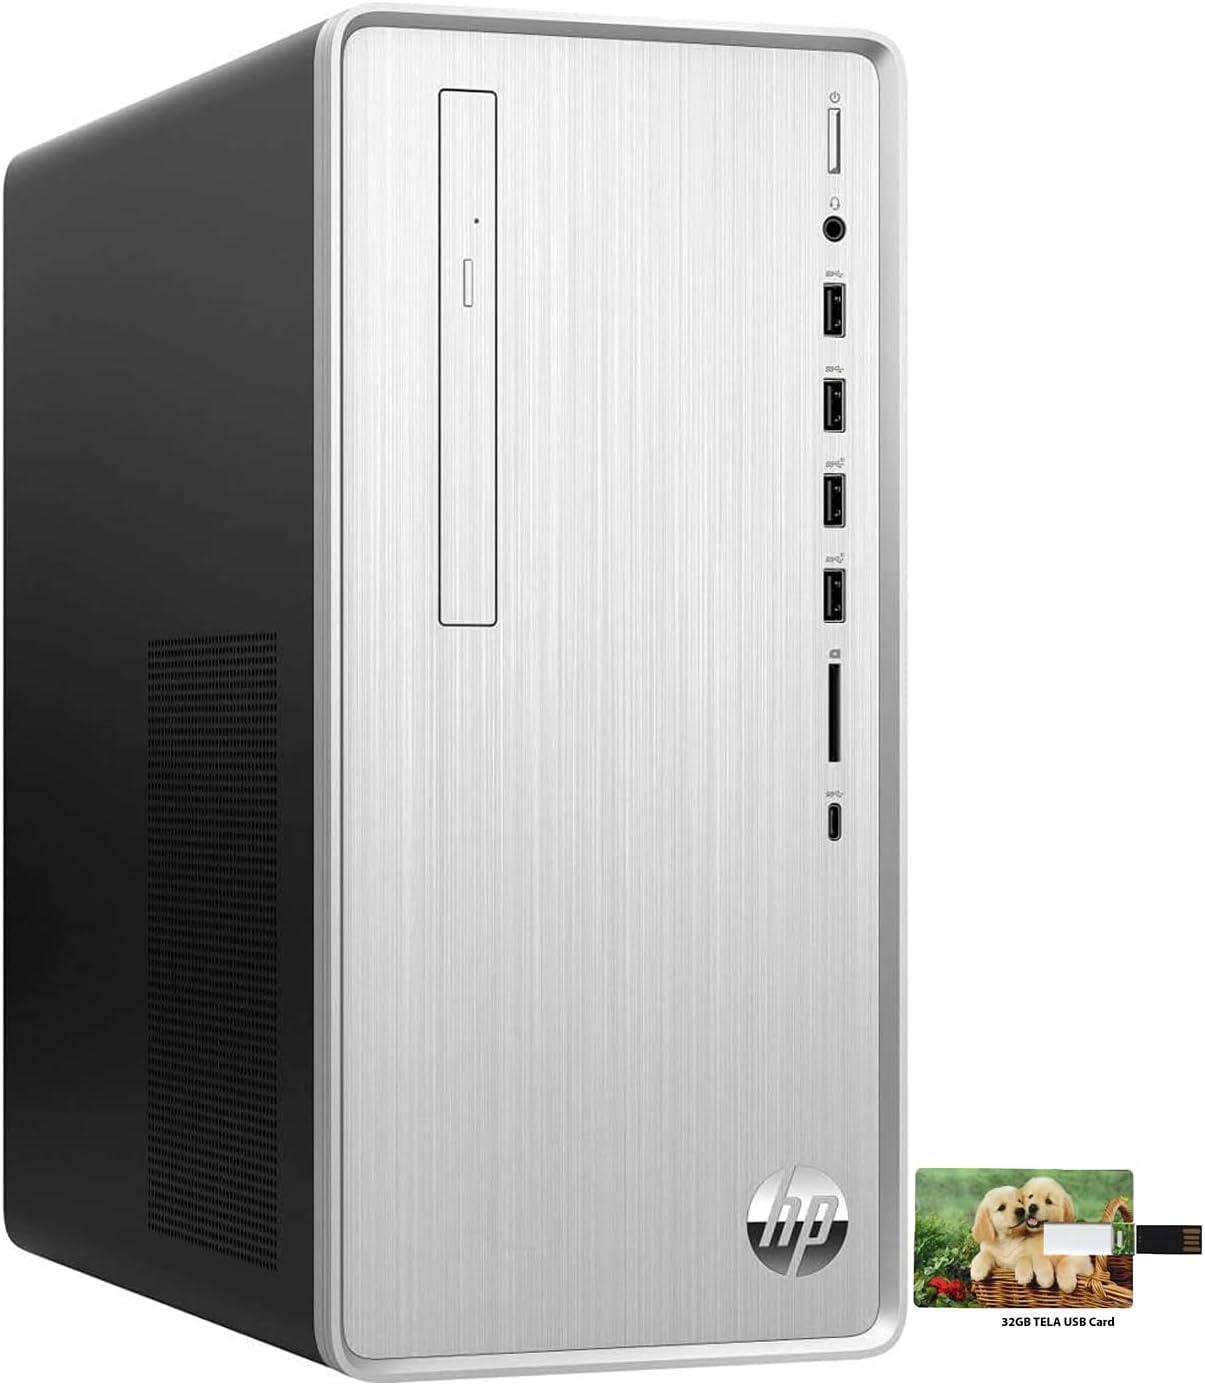 Hp Newest Pavilion Business Desktop, AMD Ryzen 5 4600G Processor, AMD Radeon Graphics, 16GB RAM, 512GB SSD+1TB HDD, Wireless-AC, DVD-RW, Type-C, HDMI, VGA, Windows 10 Pro, 32GB Tela USB Card